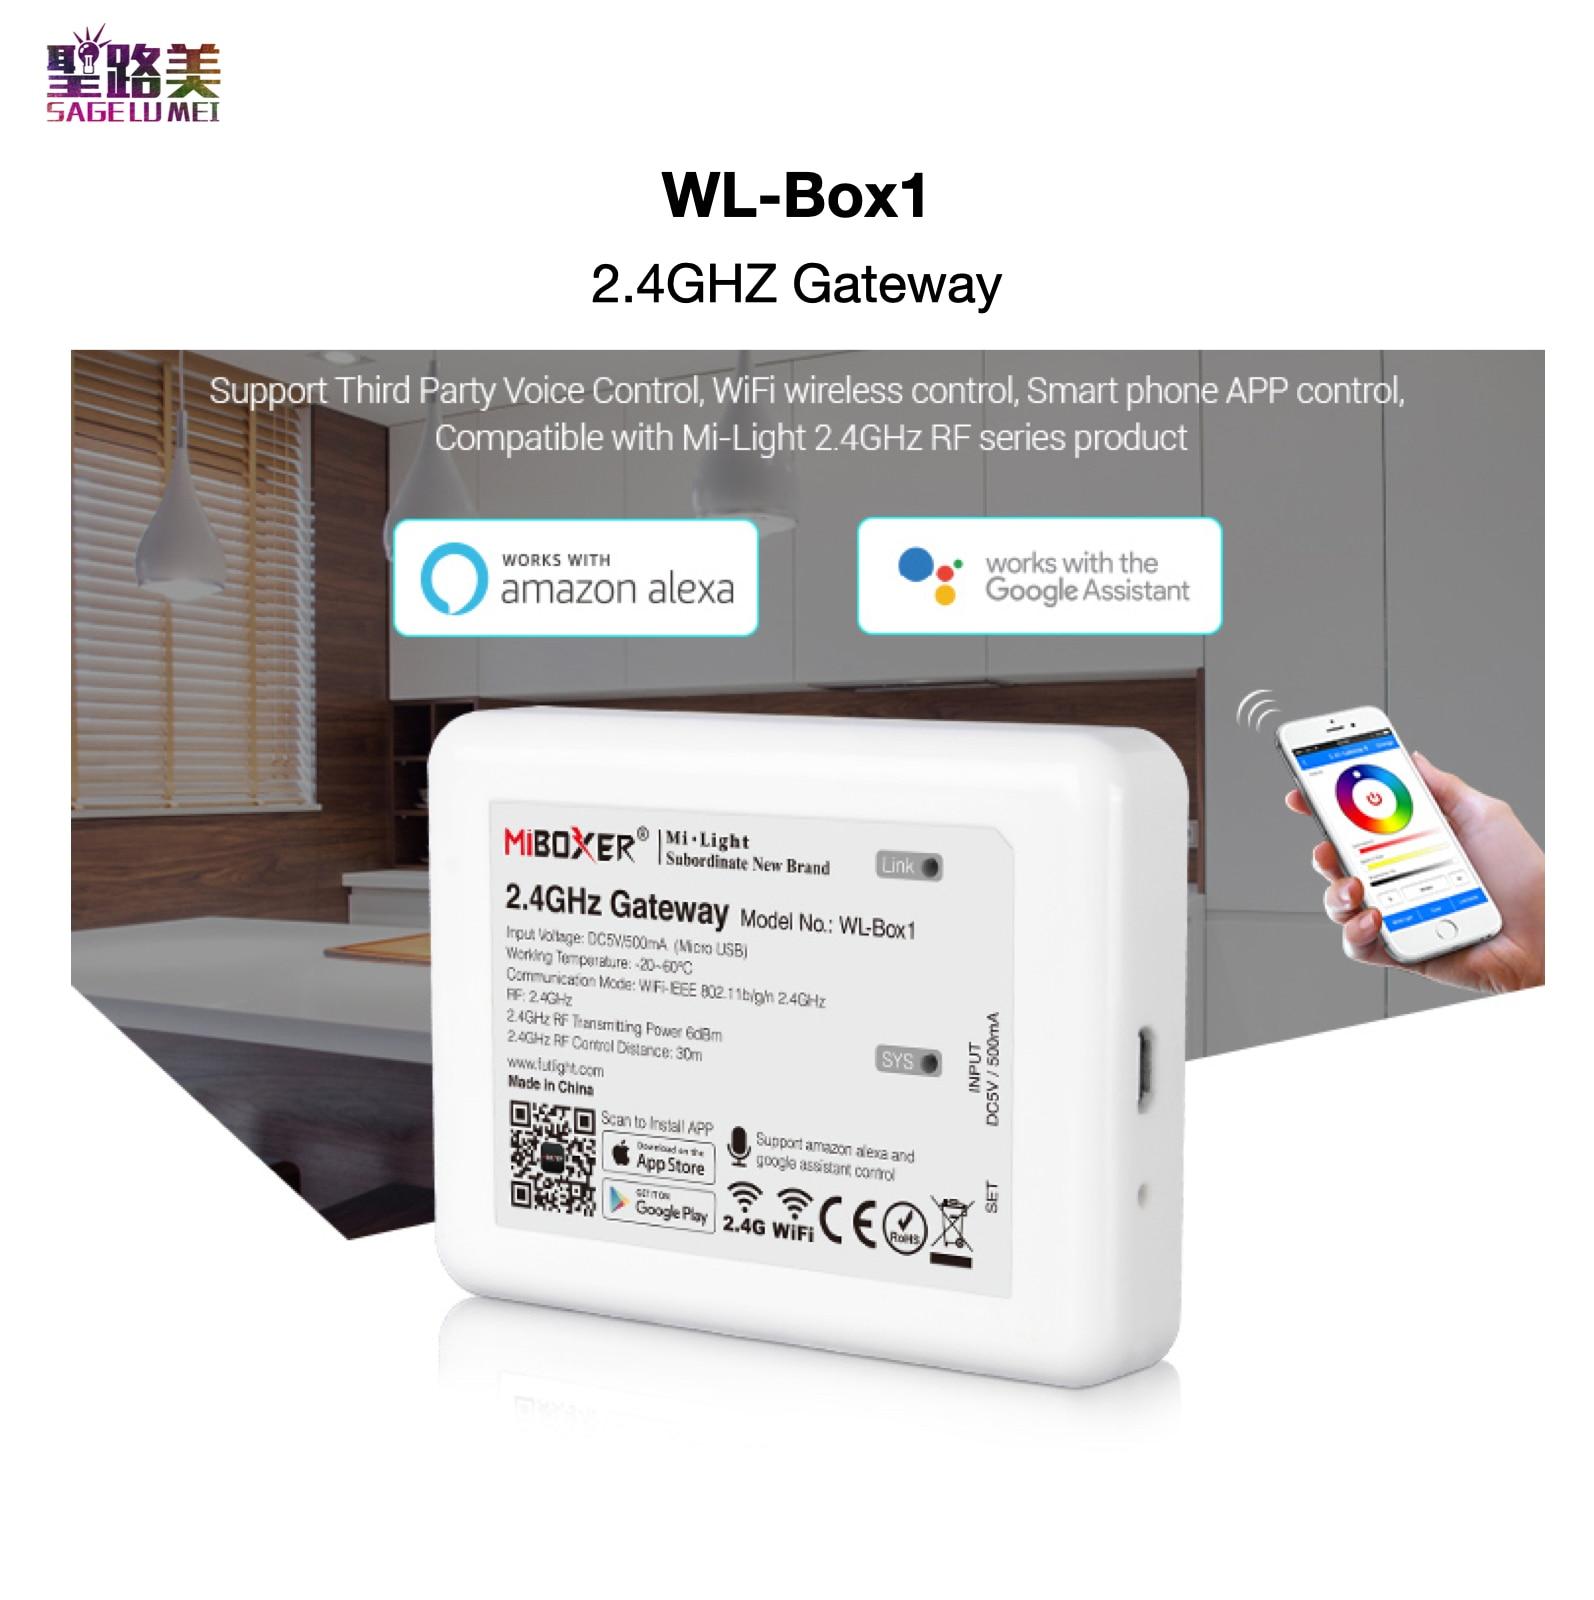 WL-Box1 2.4GHz Gateway APP / WiFi / Third Party Voice Control Compatible With Mi-Light 2.4GHz RF Series Product MiBOXER Mi-Light